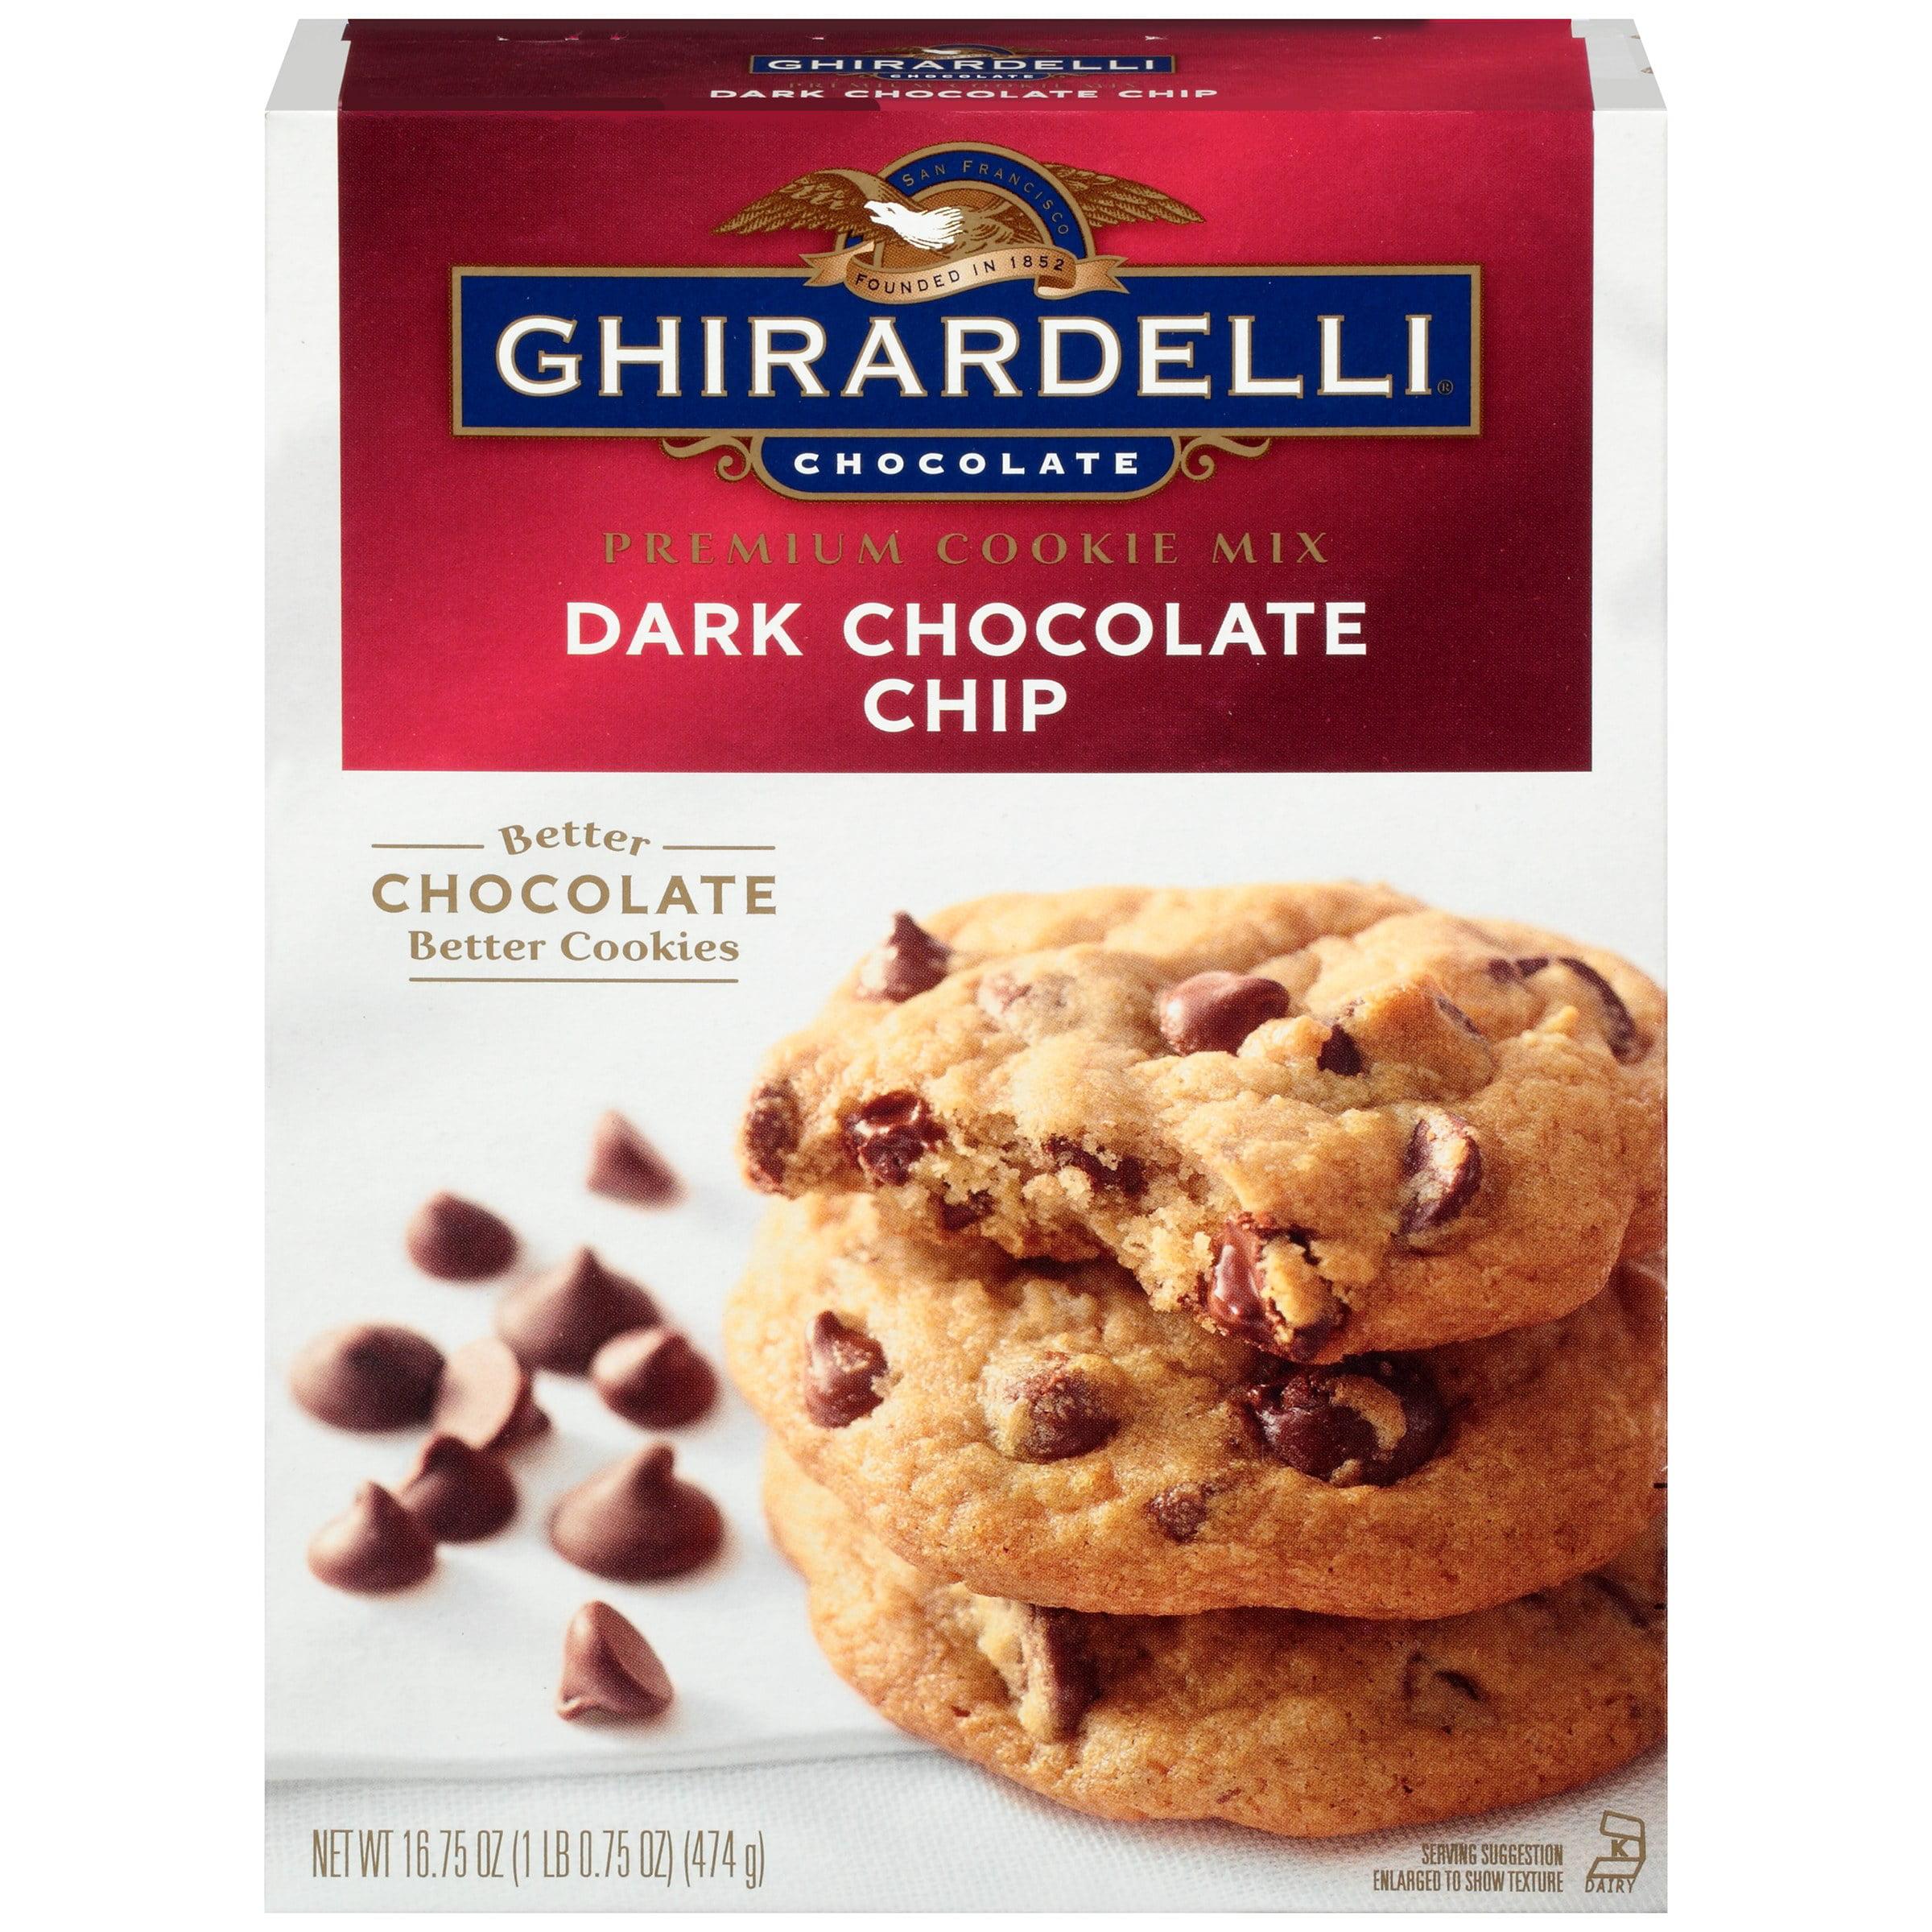 Ghirardelli Dark Chocolate Chip Cookie Mix Instructions